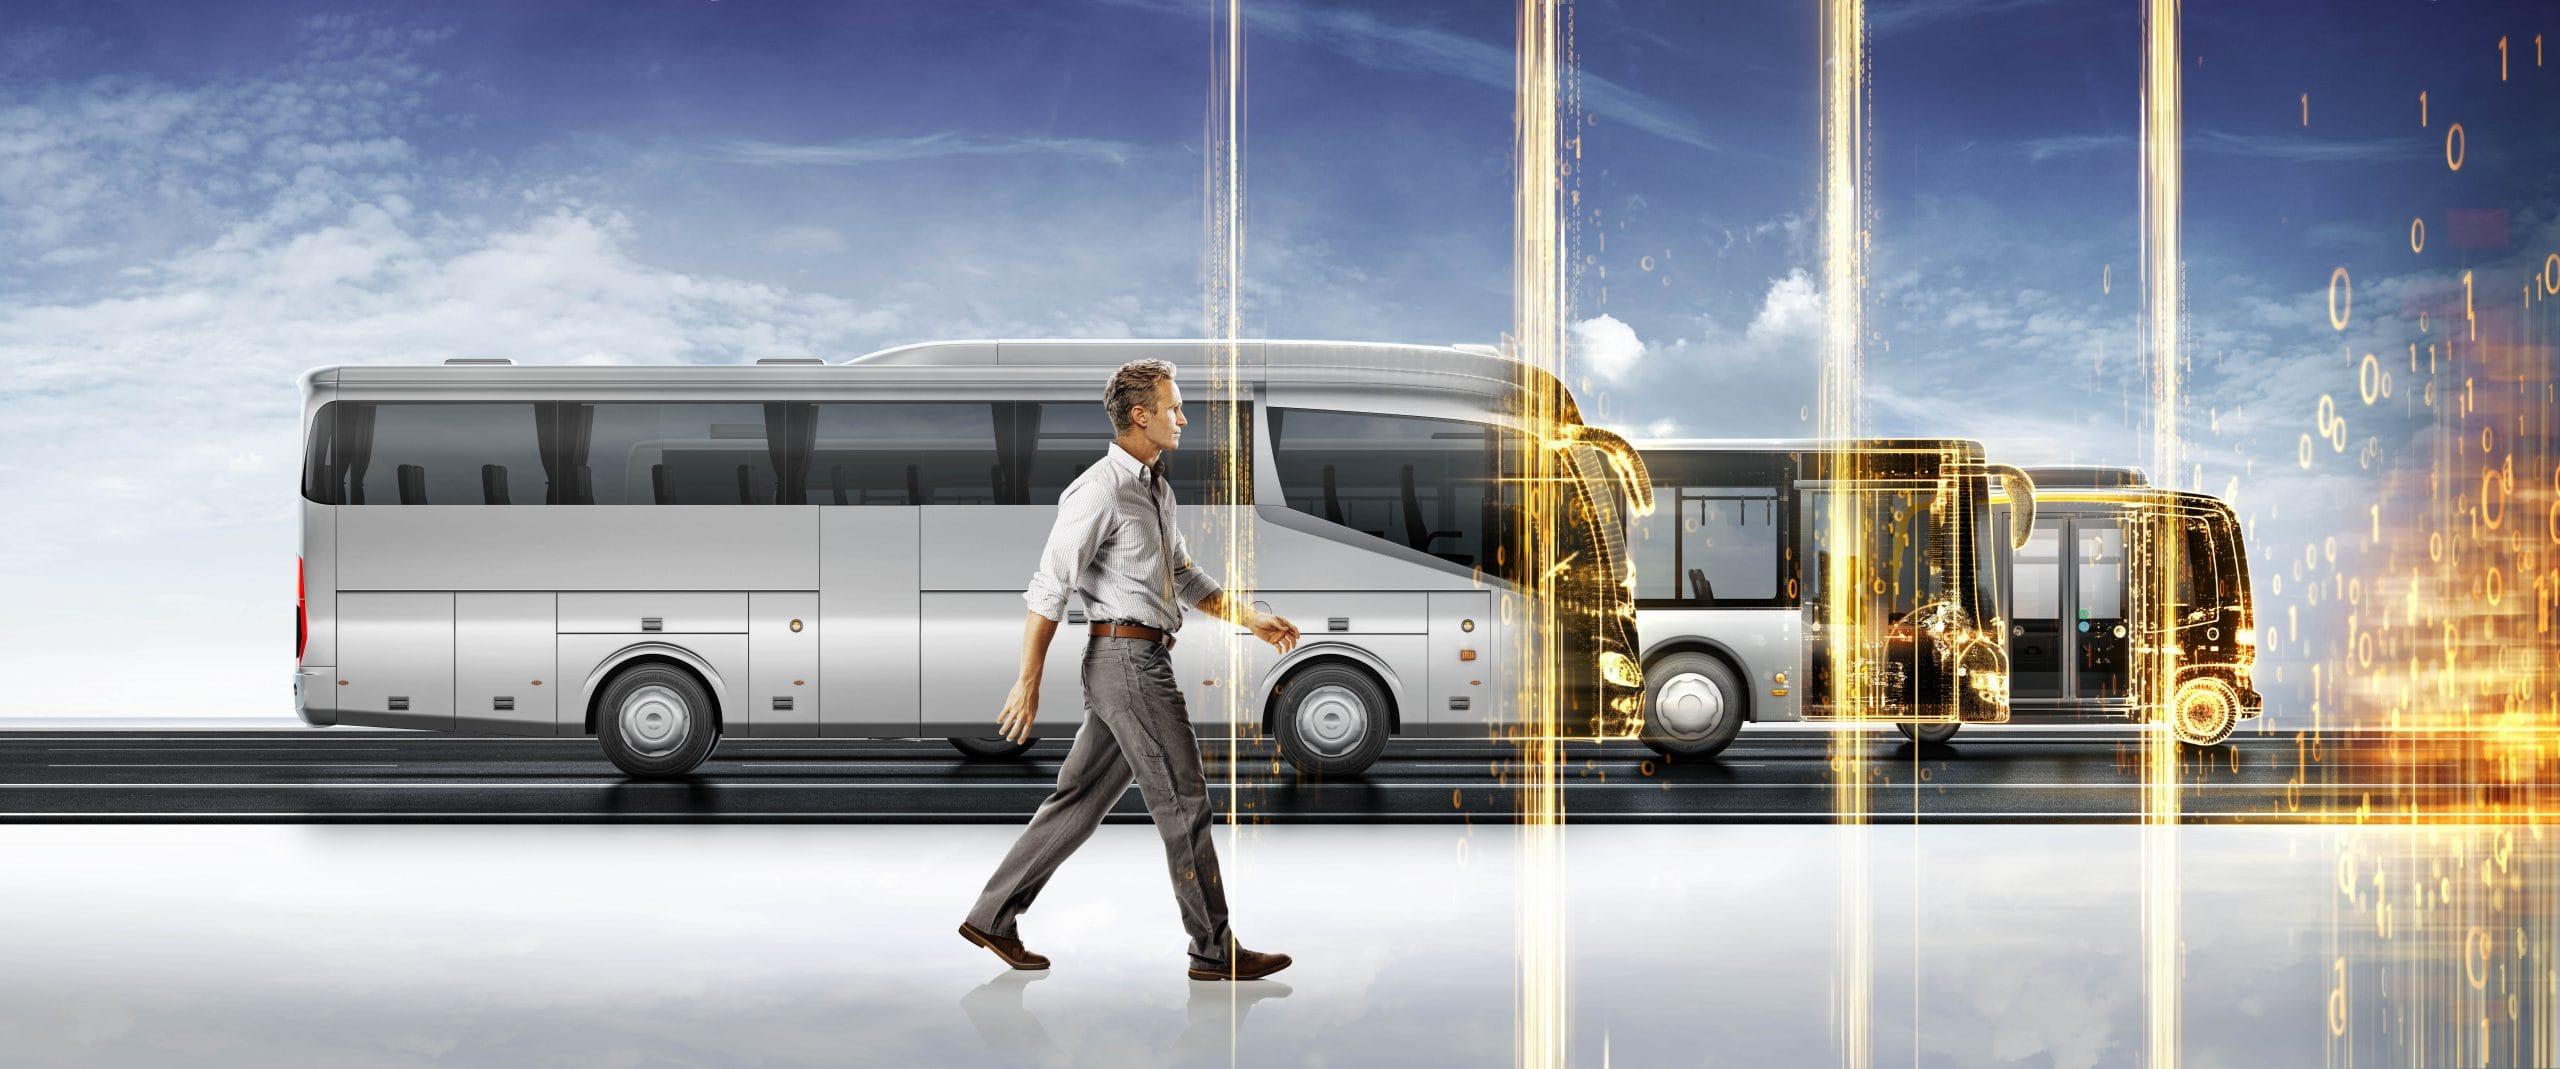 continental vdo gestione flotte bus